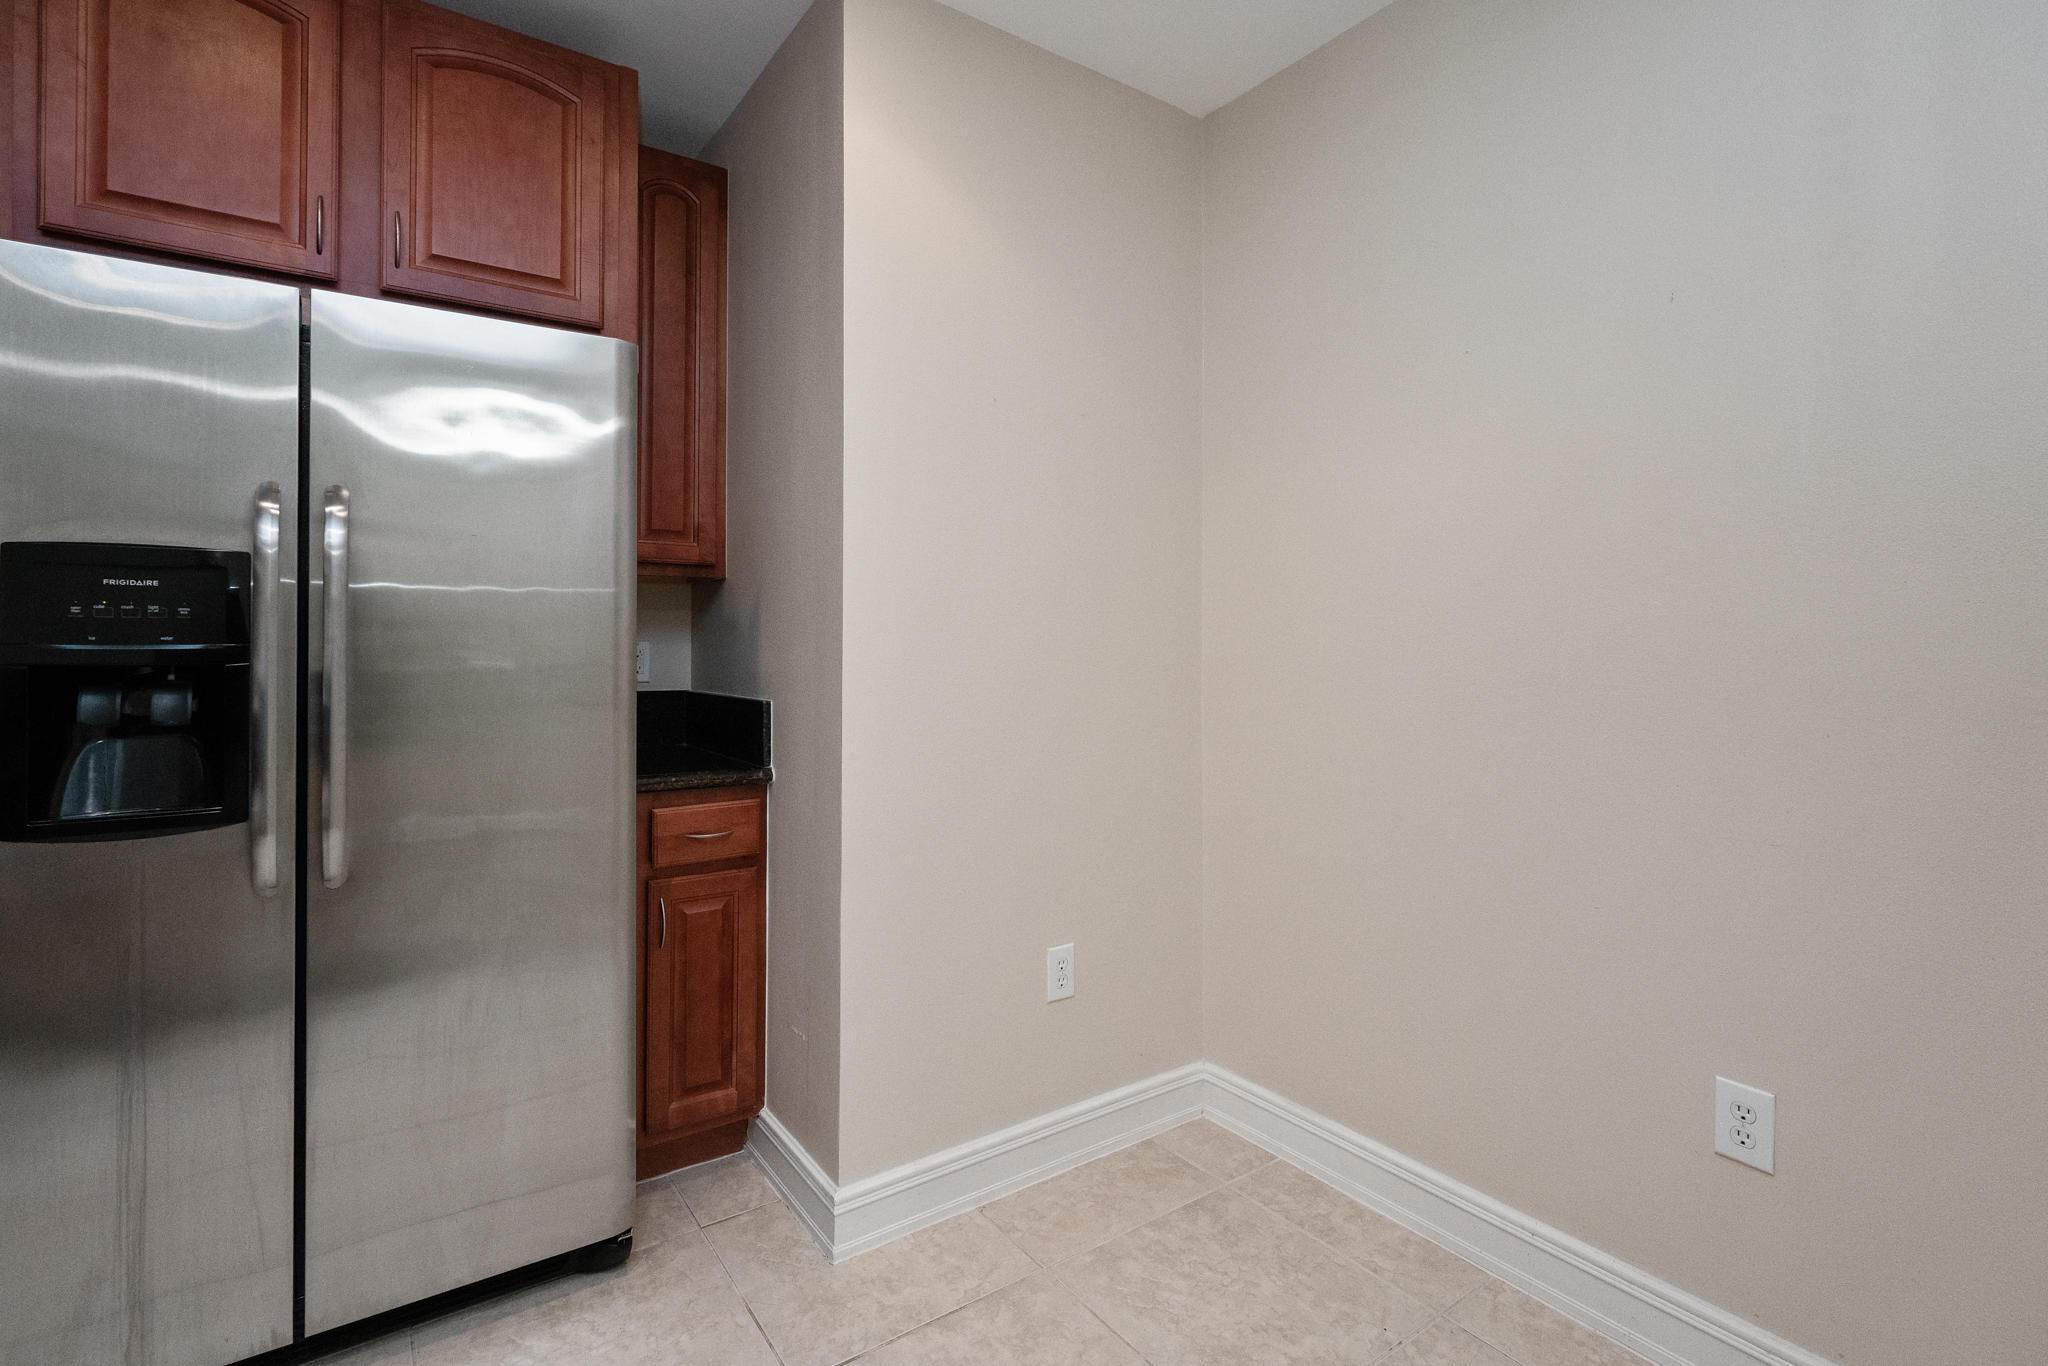 Image 5 For 16100 Emerald Estates Drive 390